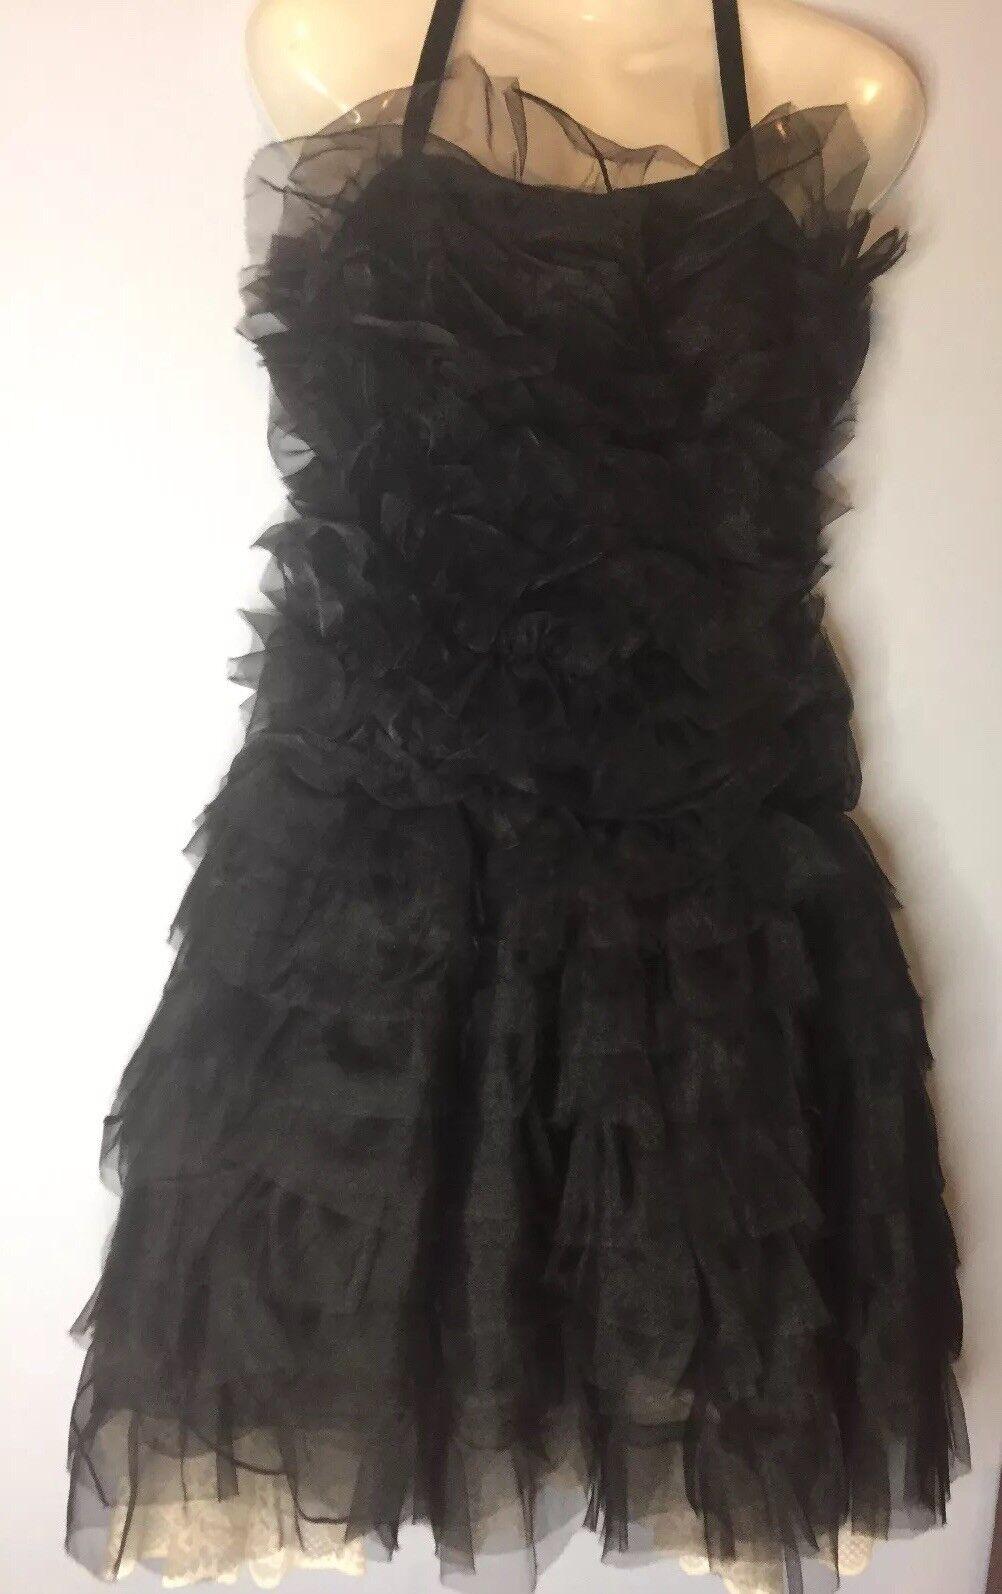 EMPORIO ARMANI Vintage schwarz Ruffle Cocktail Prom Dress Ivory Lace sz 42   4 - 6